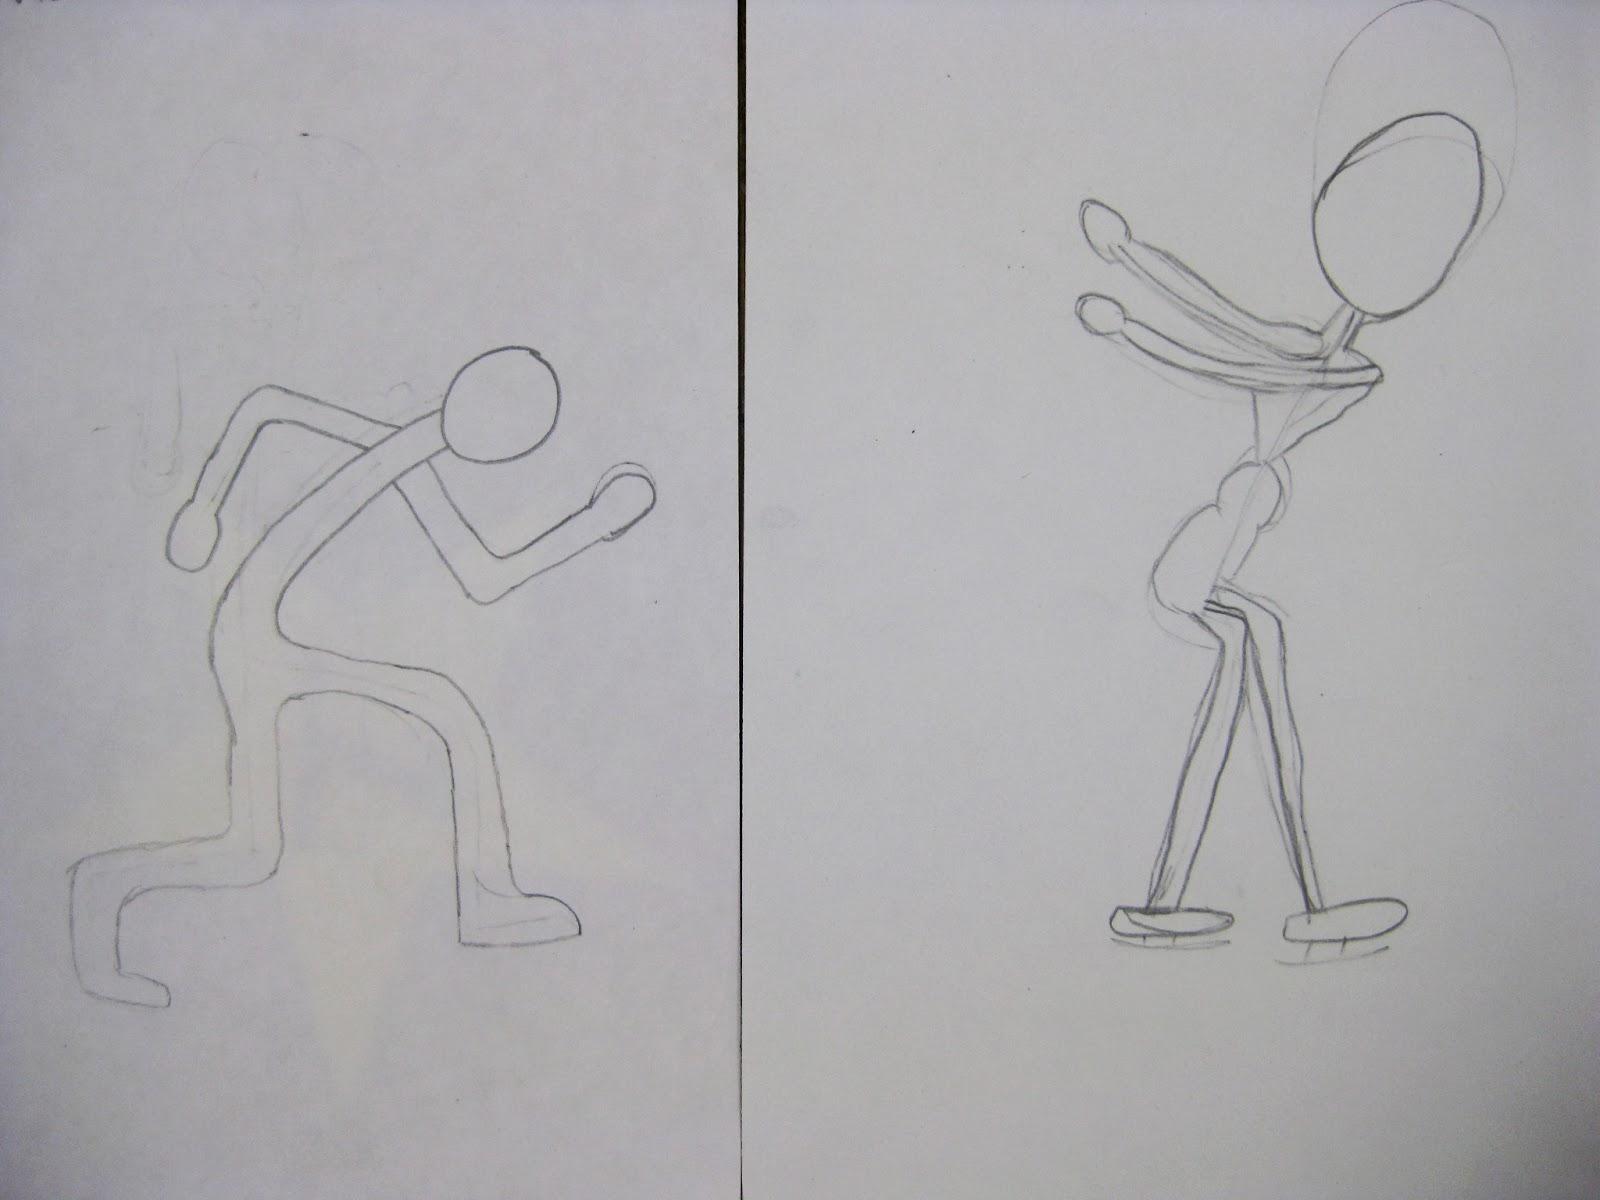 cassie stephens teaching figure drawing to kids